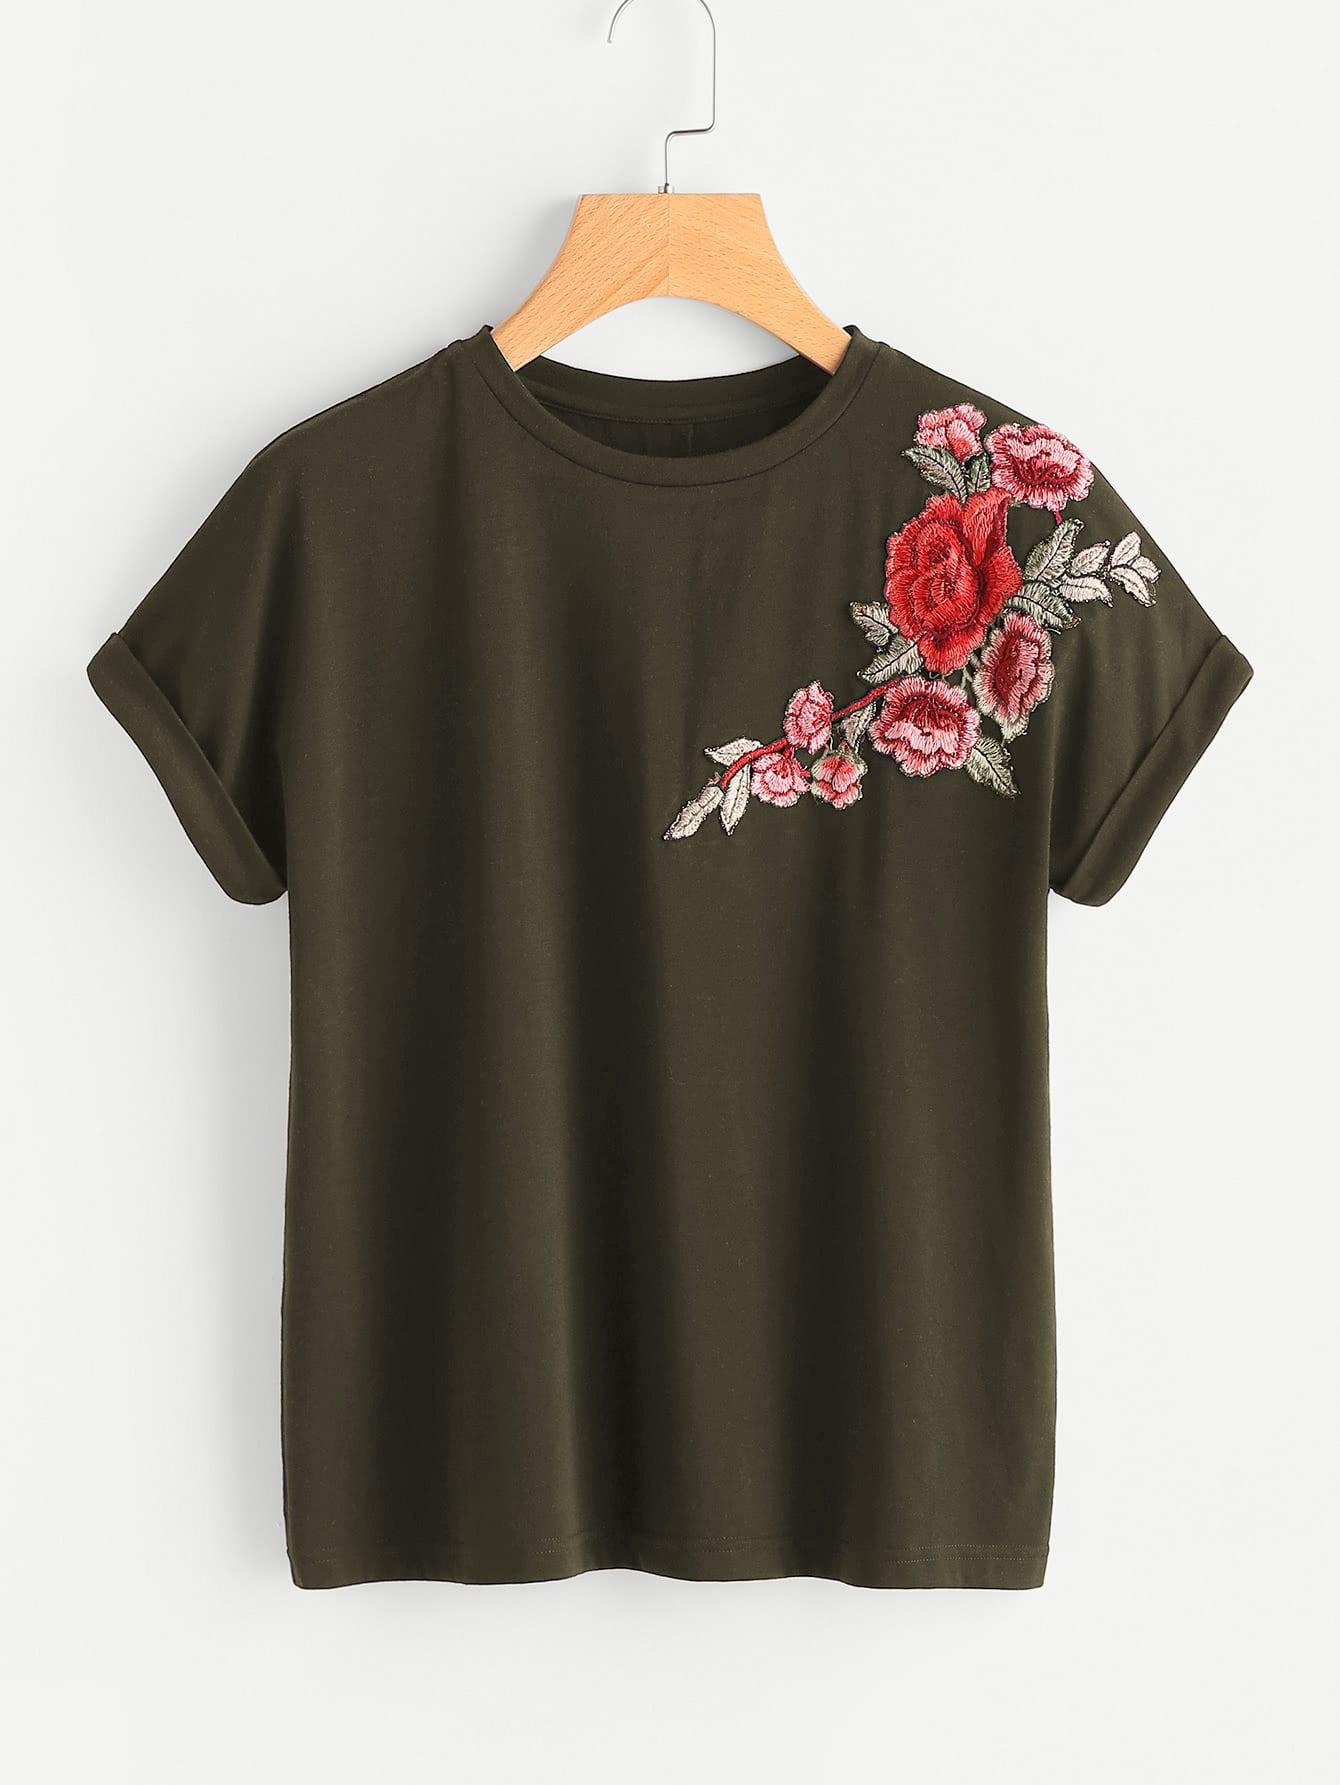 Flower Patch Cuffed Sleeve Tee flower patch full length tee dress